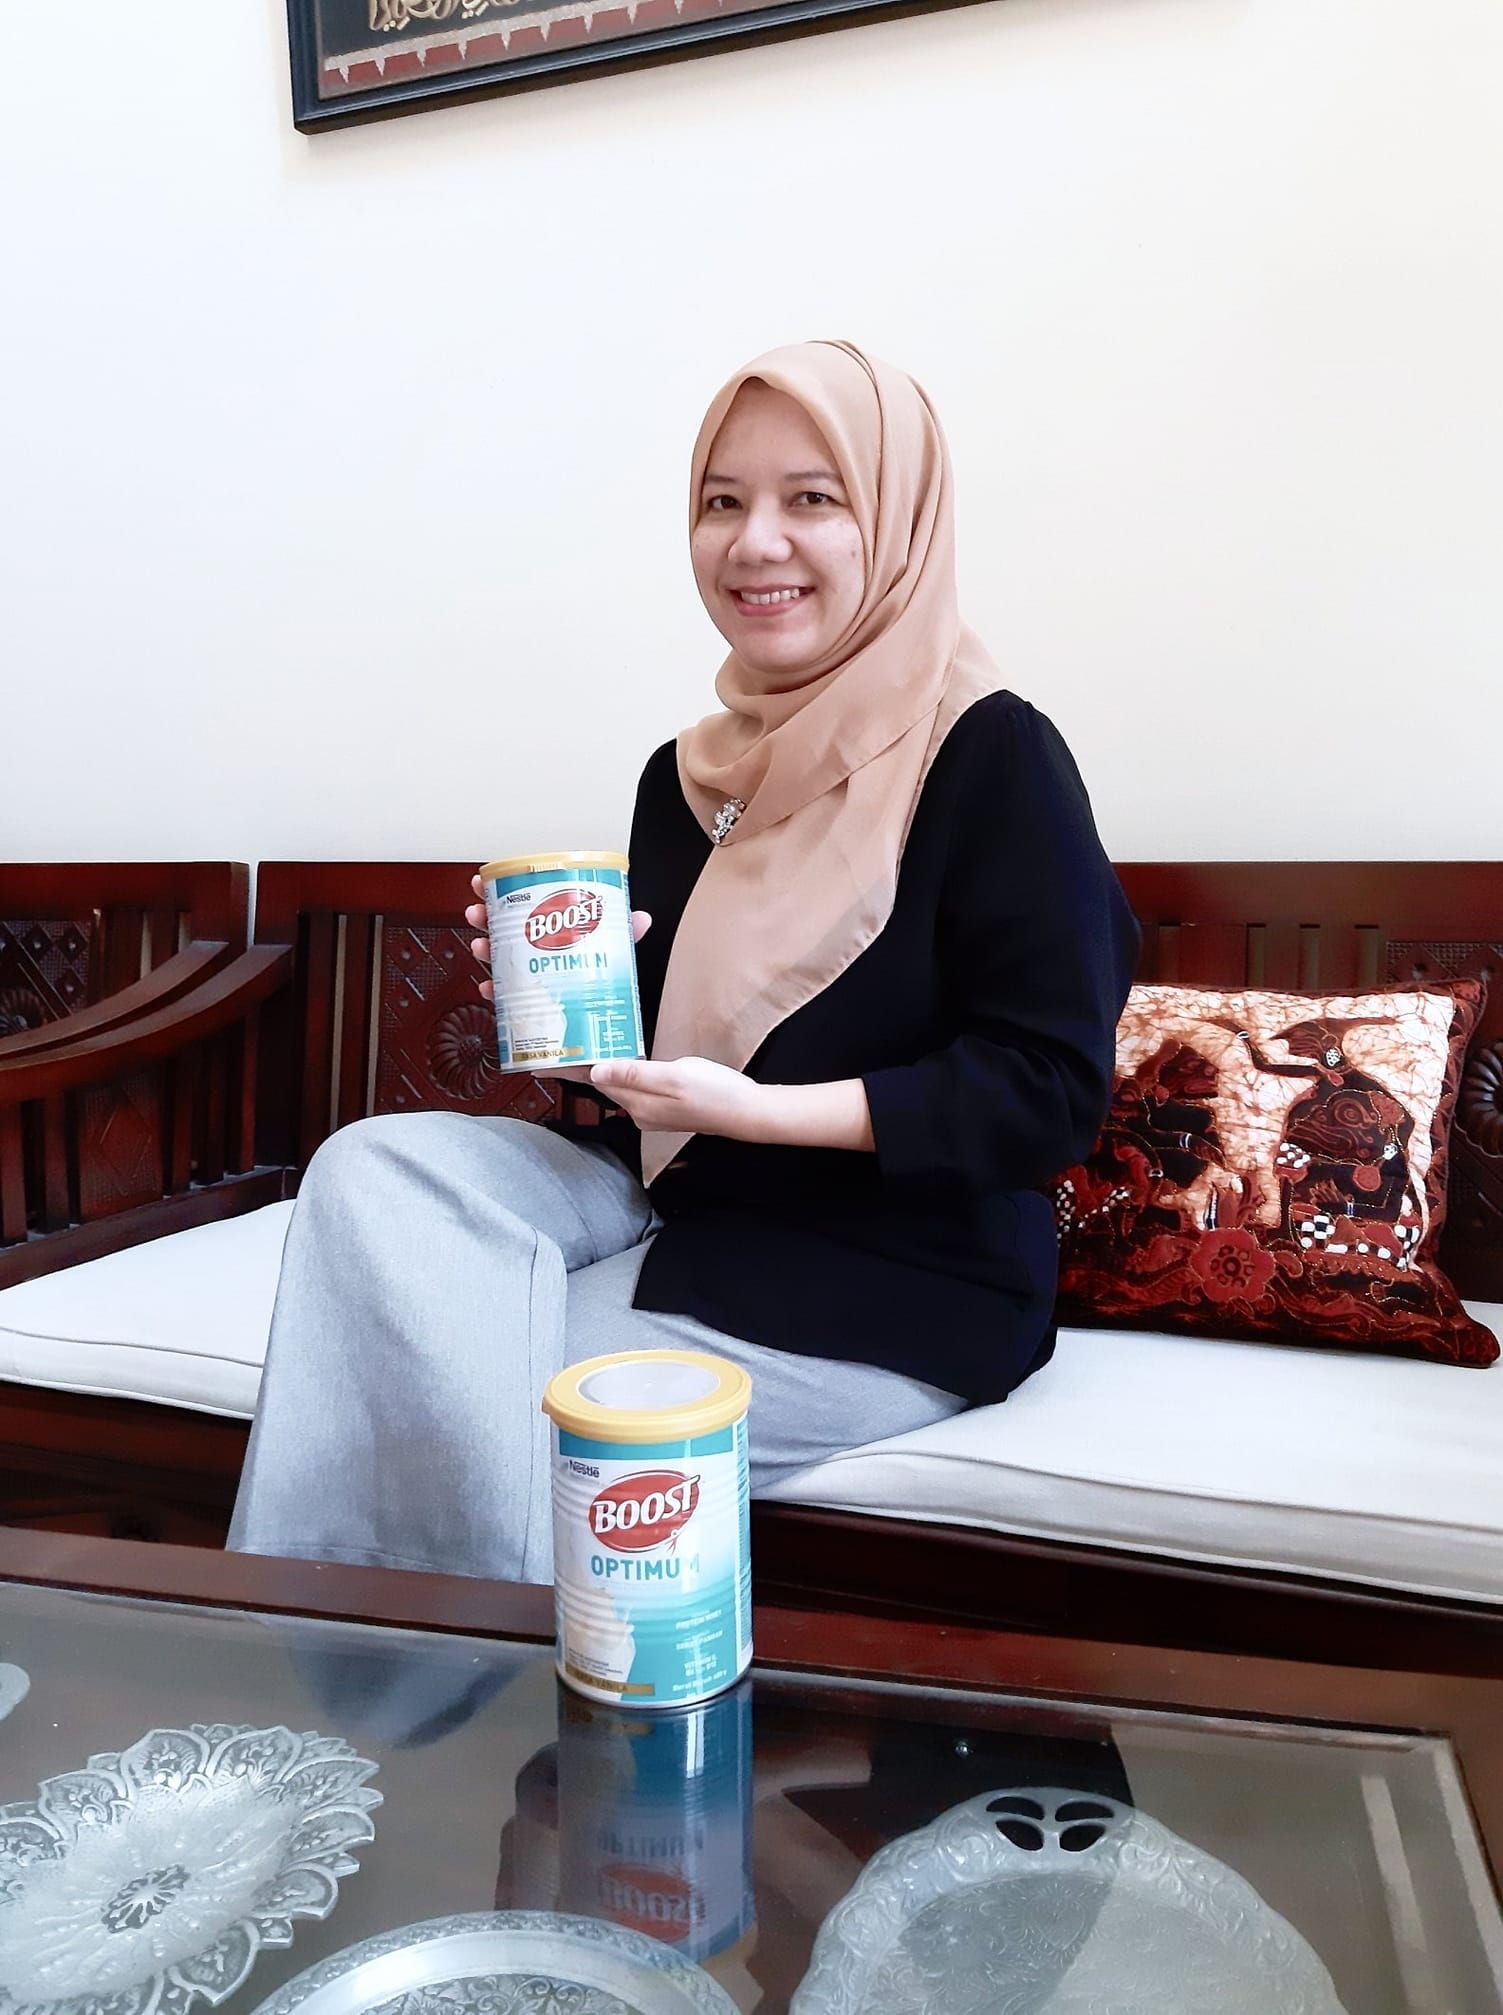 Boost optimum susu untuk orang tua nestle health science nurul sufitri travel lifestyle blogger review